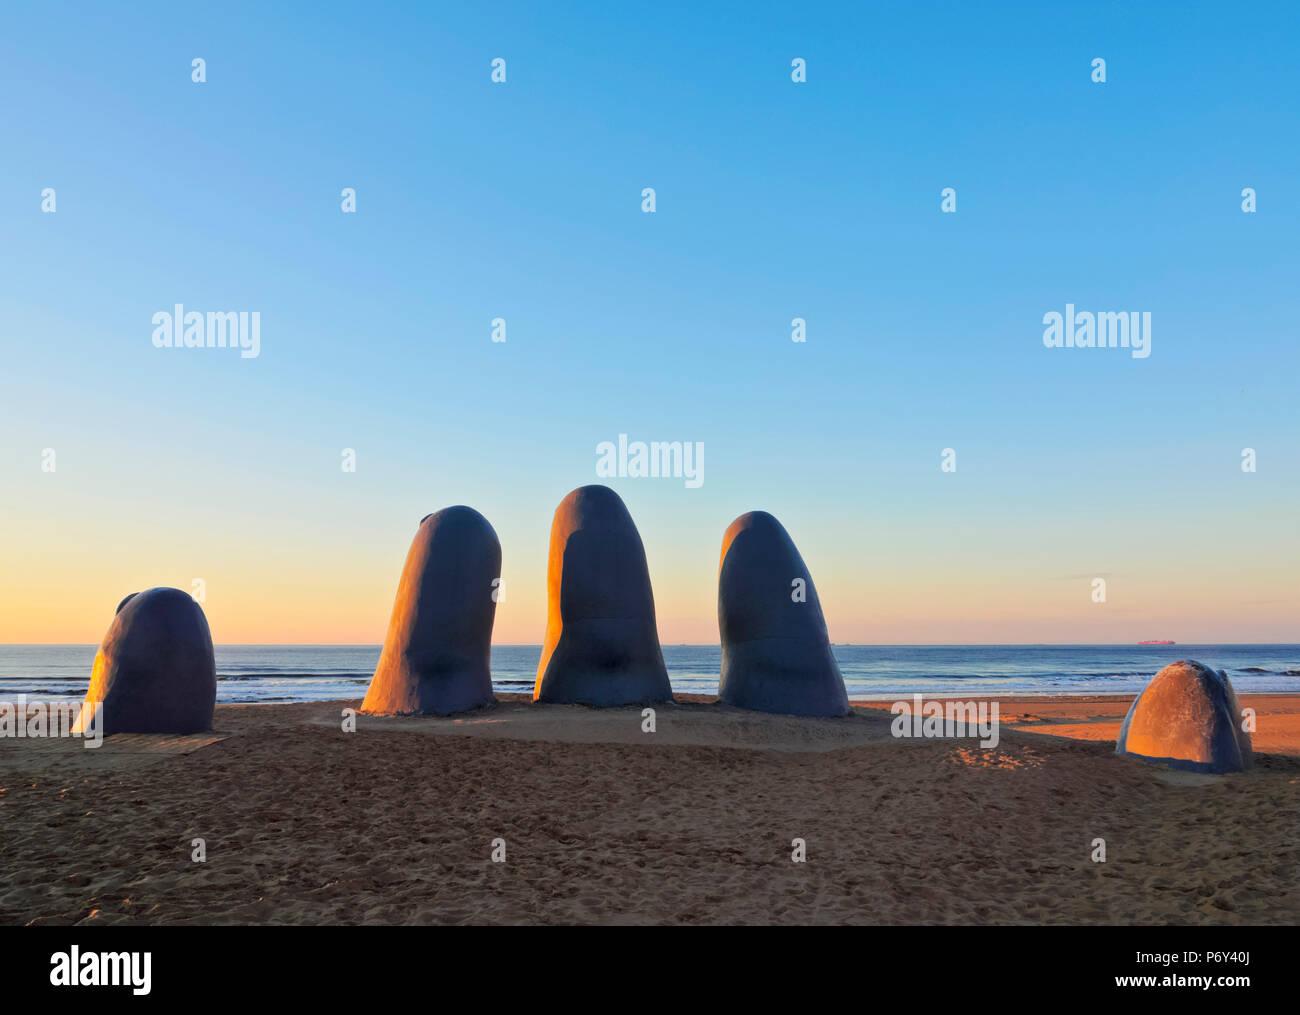 Uruguay, Maldonado Department, Punta del Este, Playa Brava, La Mano(The Hand), a sculpture by Chilean artist Mario Irarrazabal at sunrise. - Stock Image